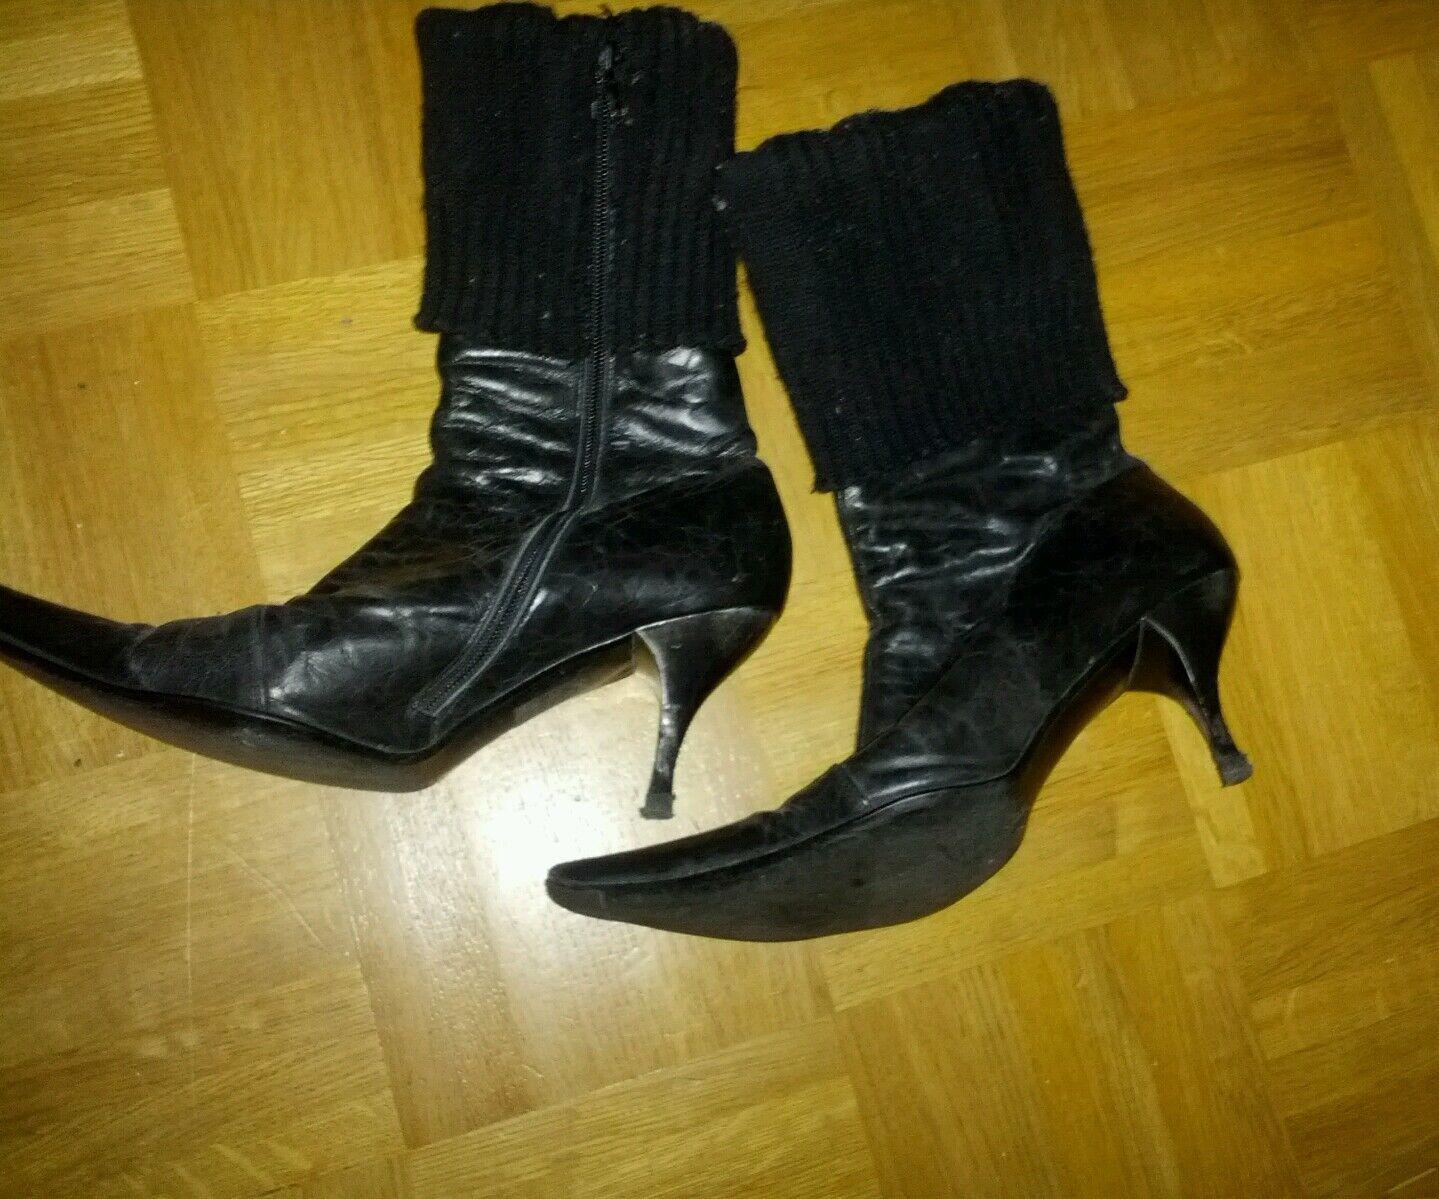 Buffalo, Stiefel, schwarz, Leder, Gr. 40, gebraucht